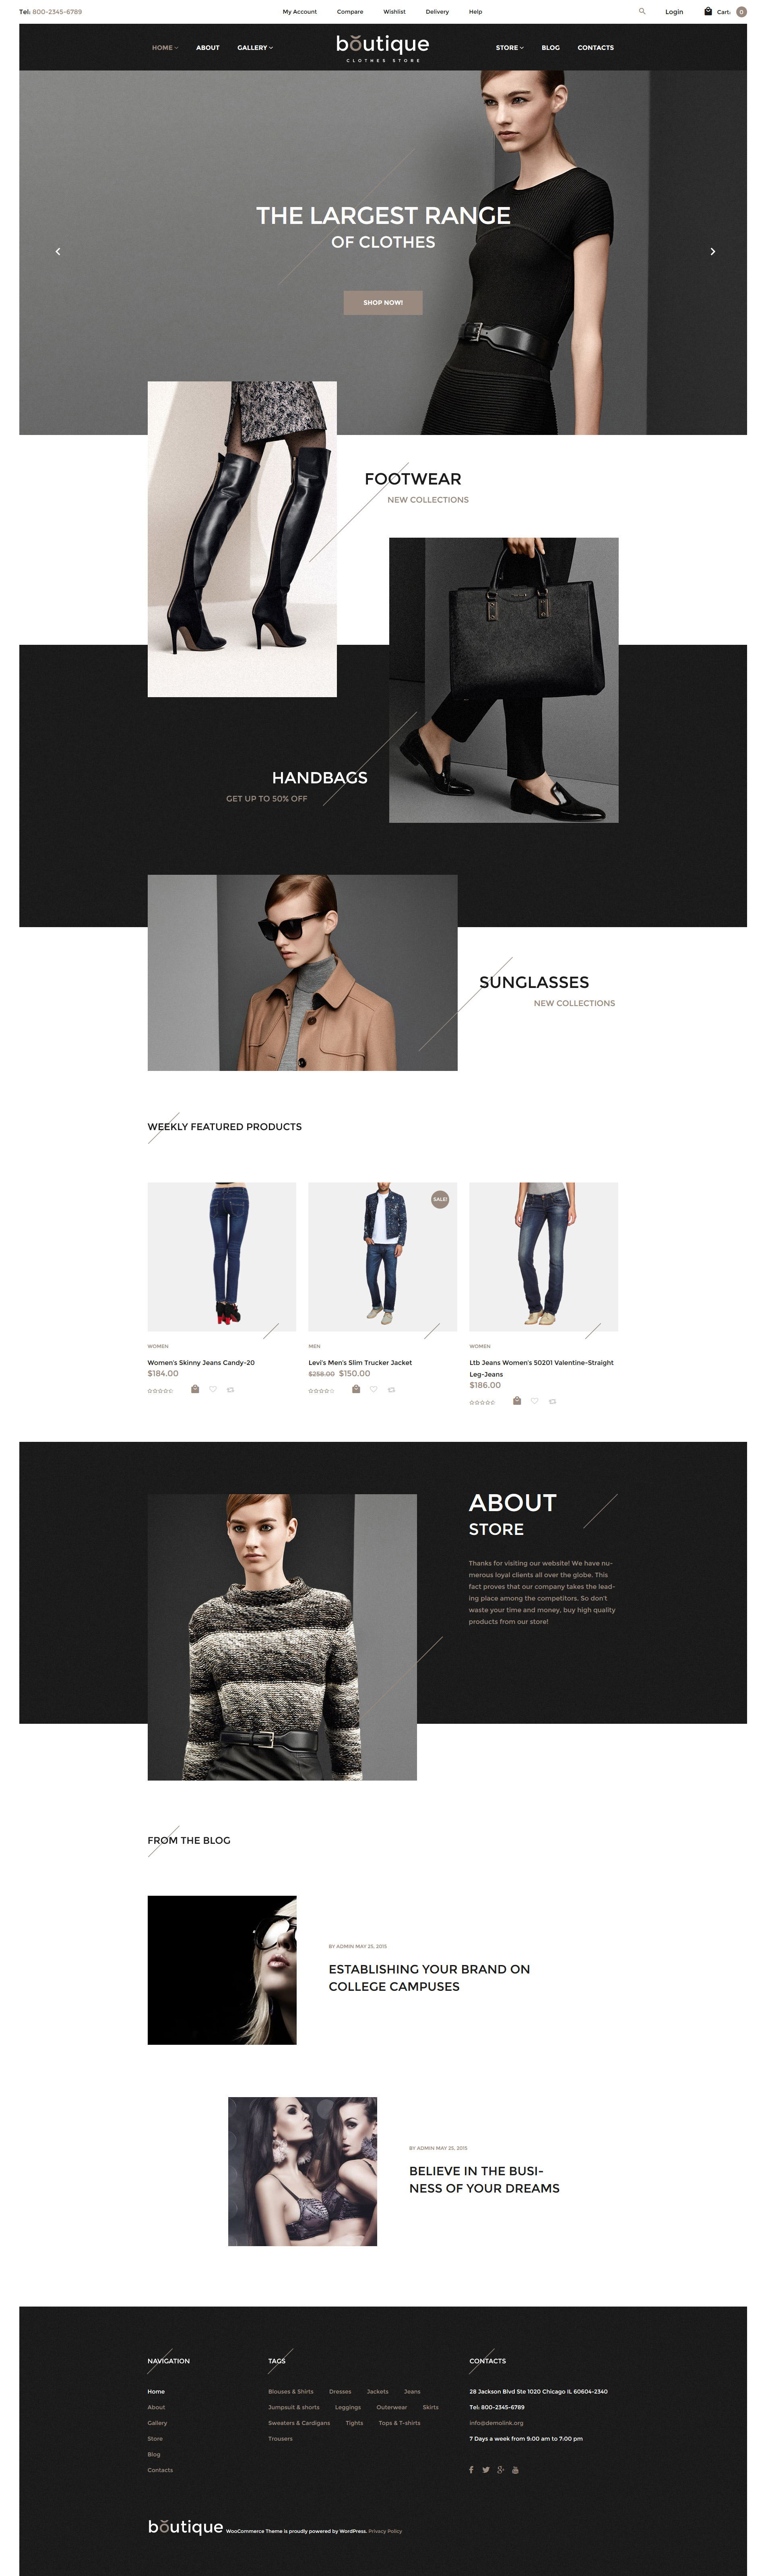 Responsivt Boutique WooCommerce-tema #57736 - skärmbild